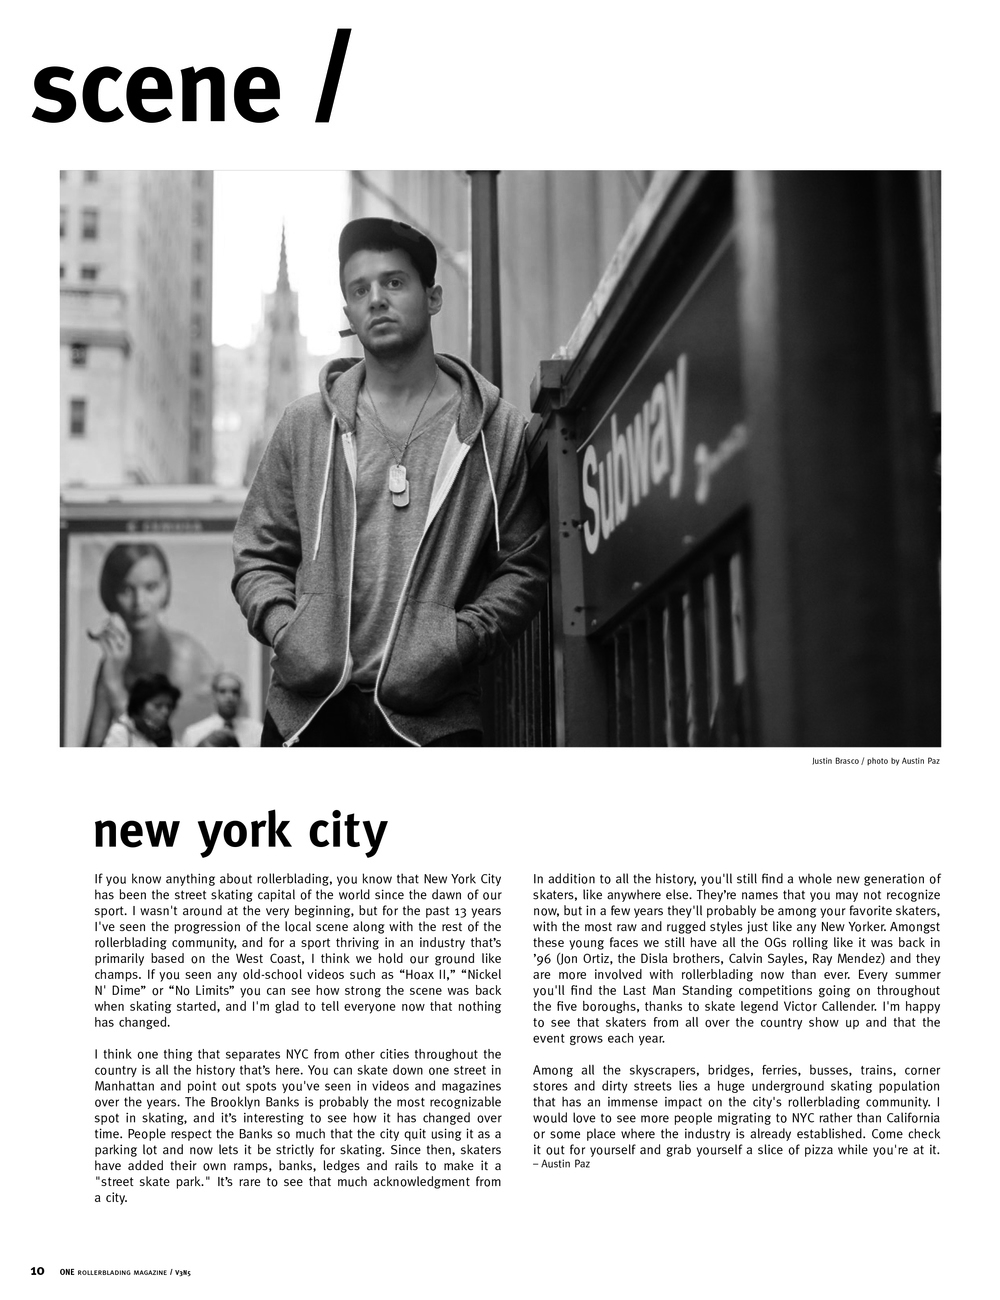 austin paz justin brasco one magazine nyc